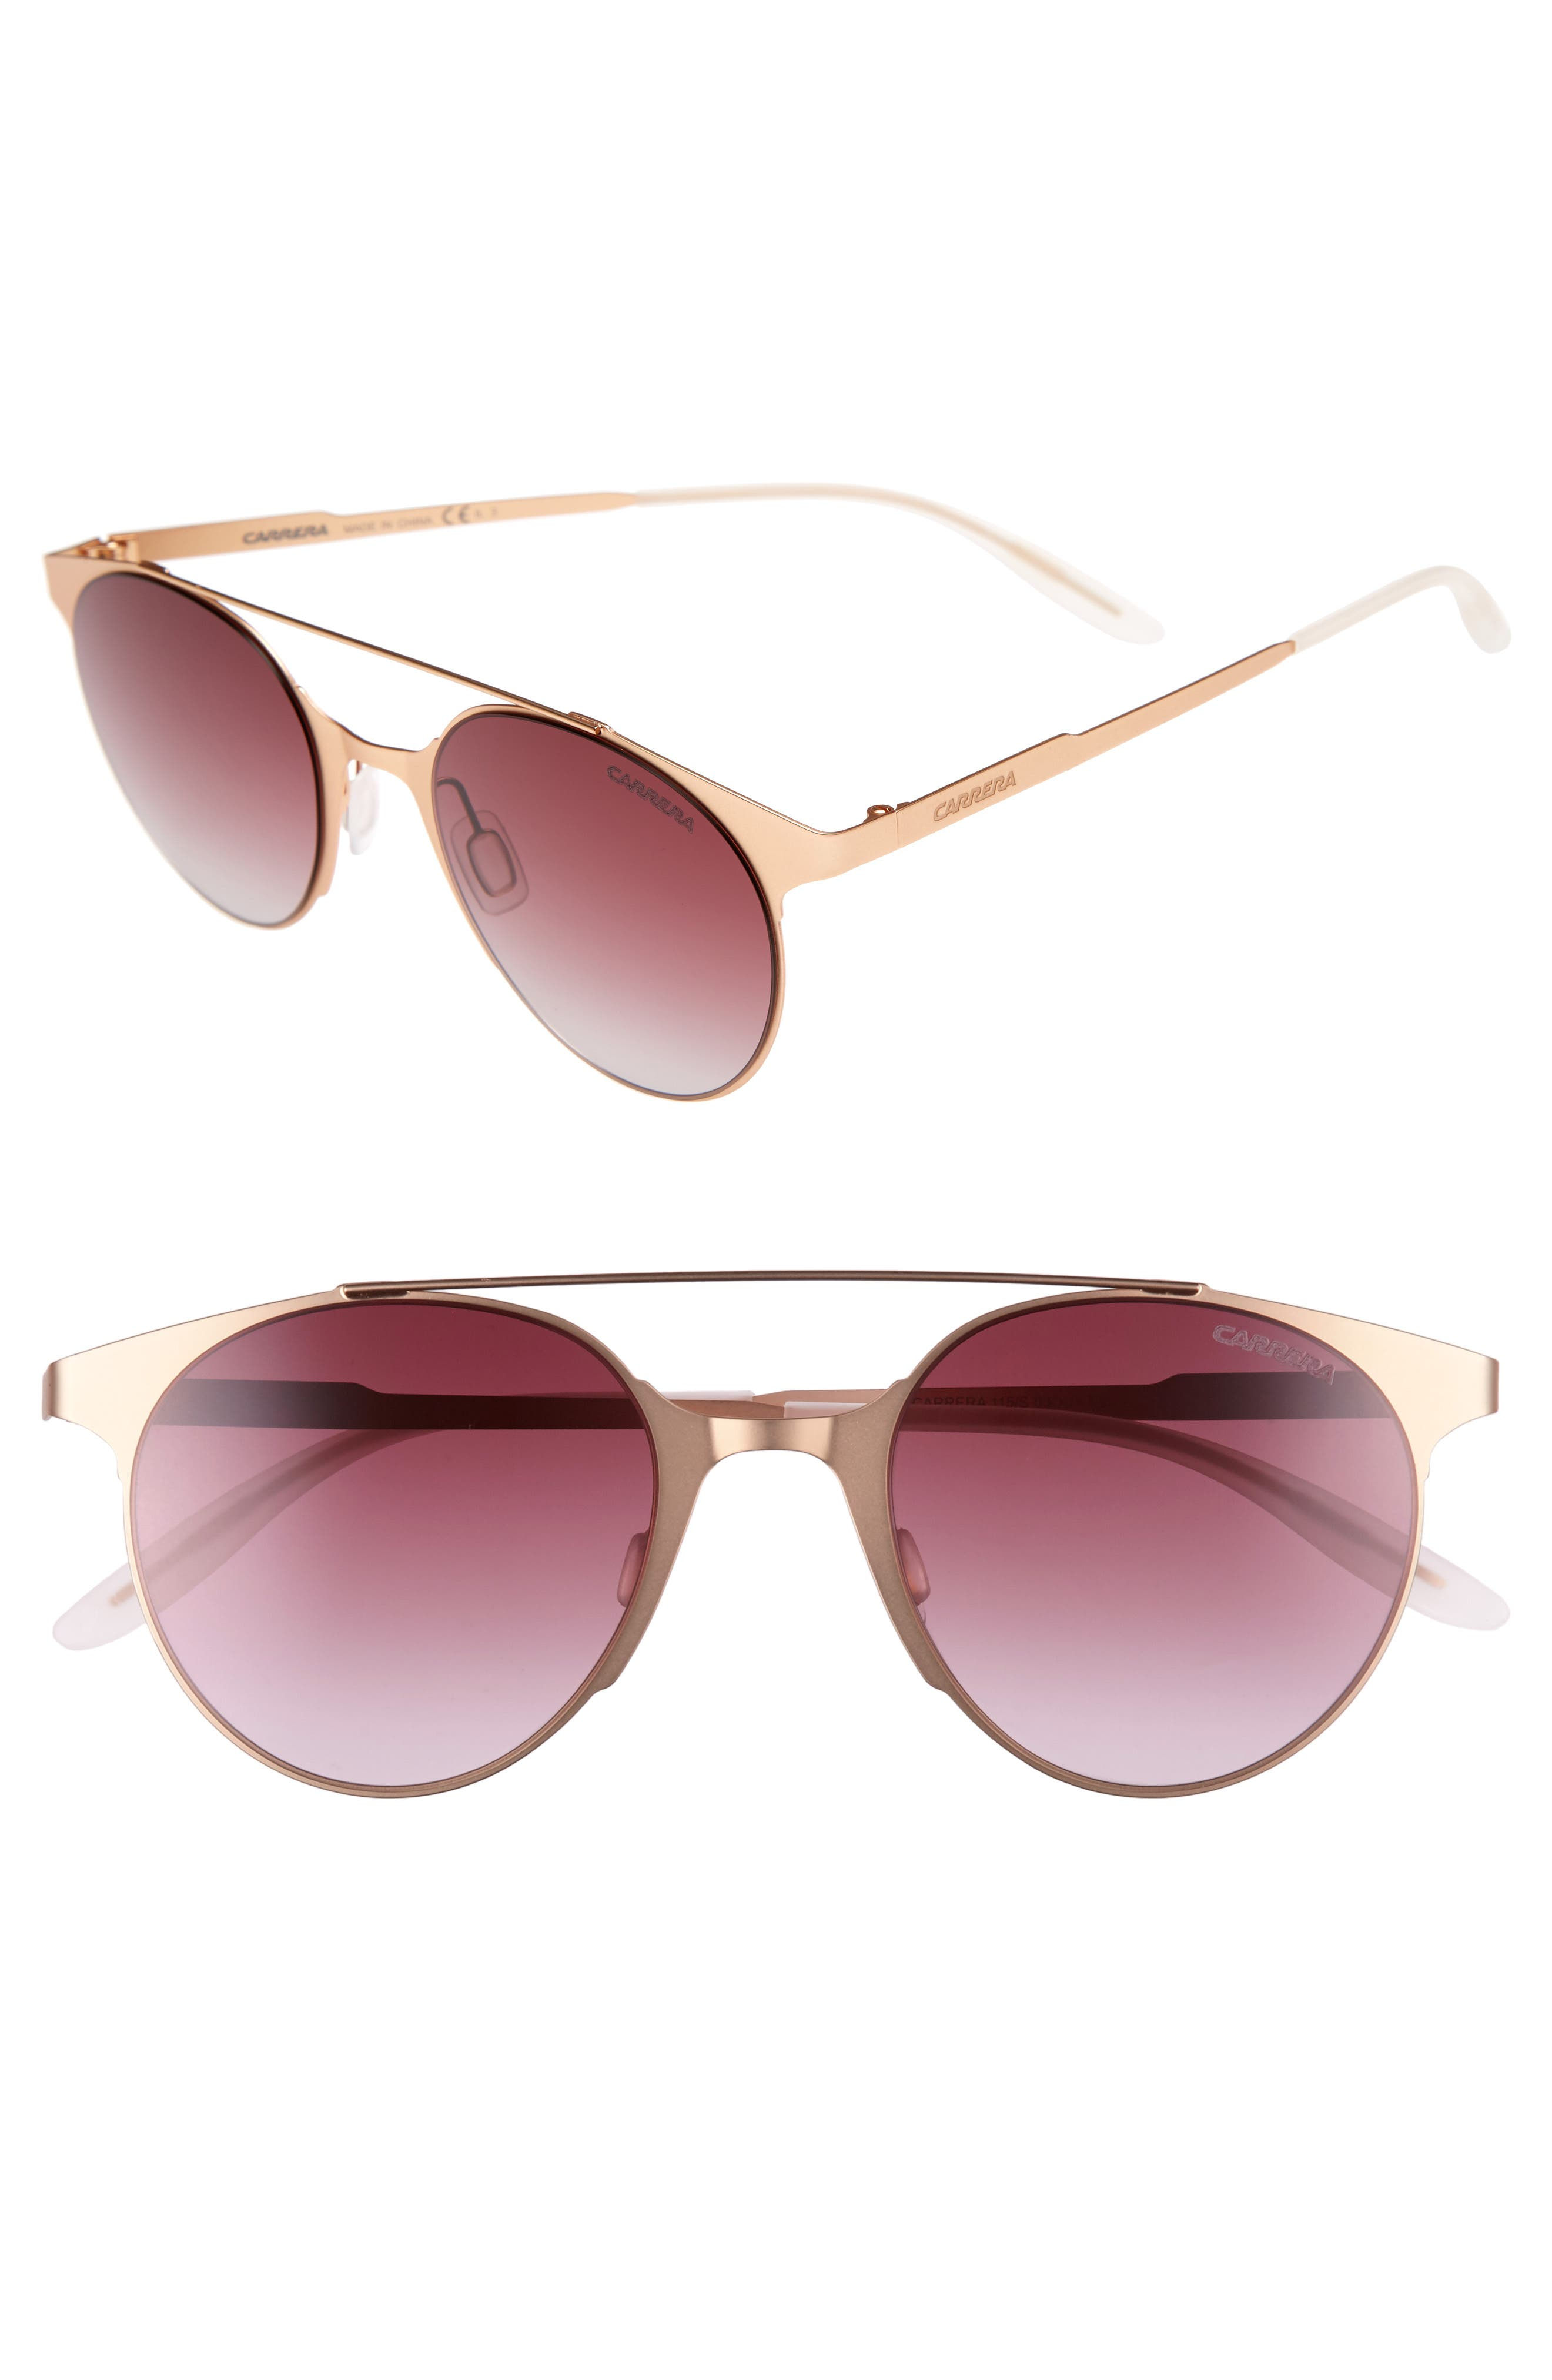 Alternate Image 1 Selected - Carrera Eyewear 50mm Gradient Round Sunglasses